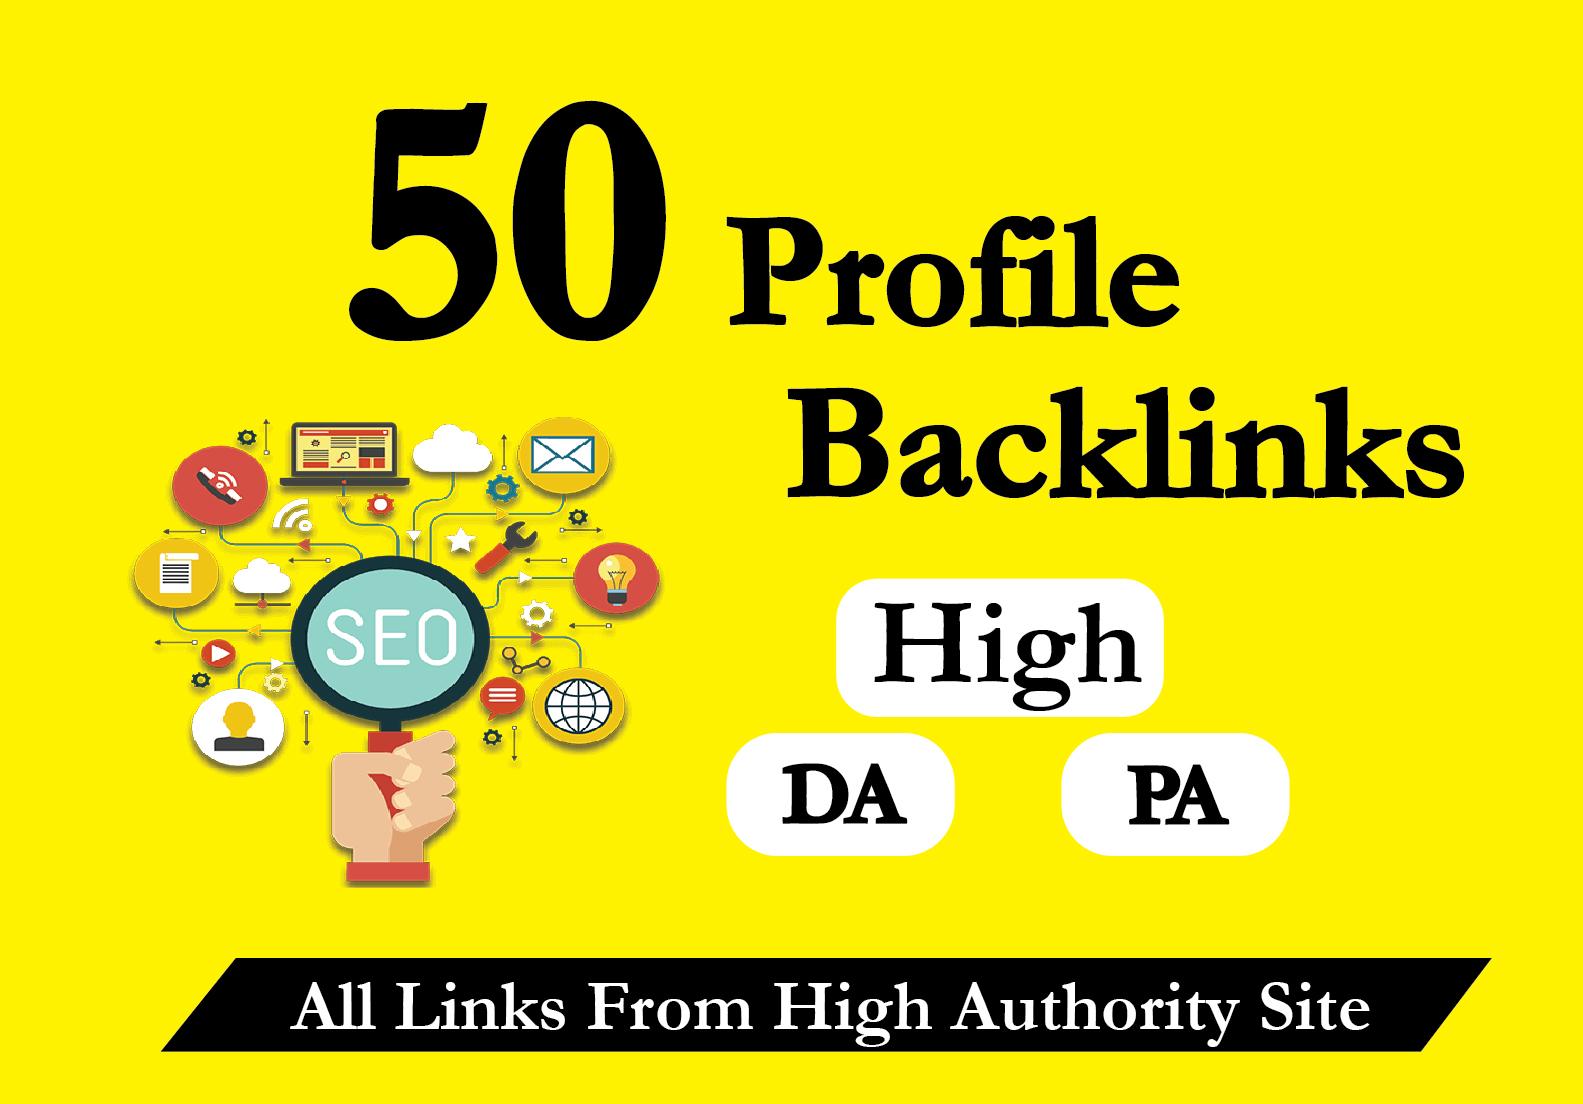 I Will Create 50 High Authority 80+ DA PA Profile Backlinks Creations Manually for SEO Ranking